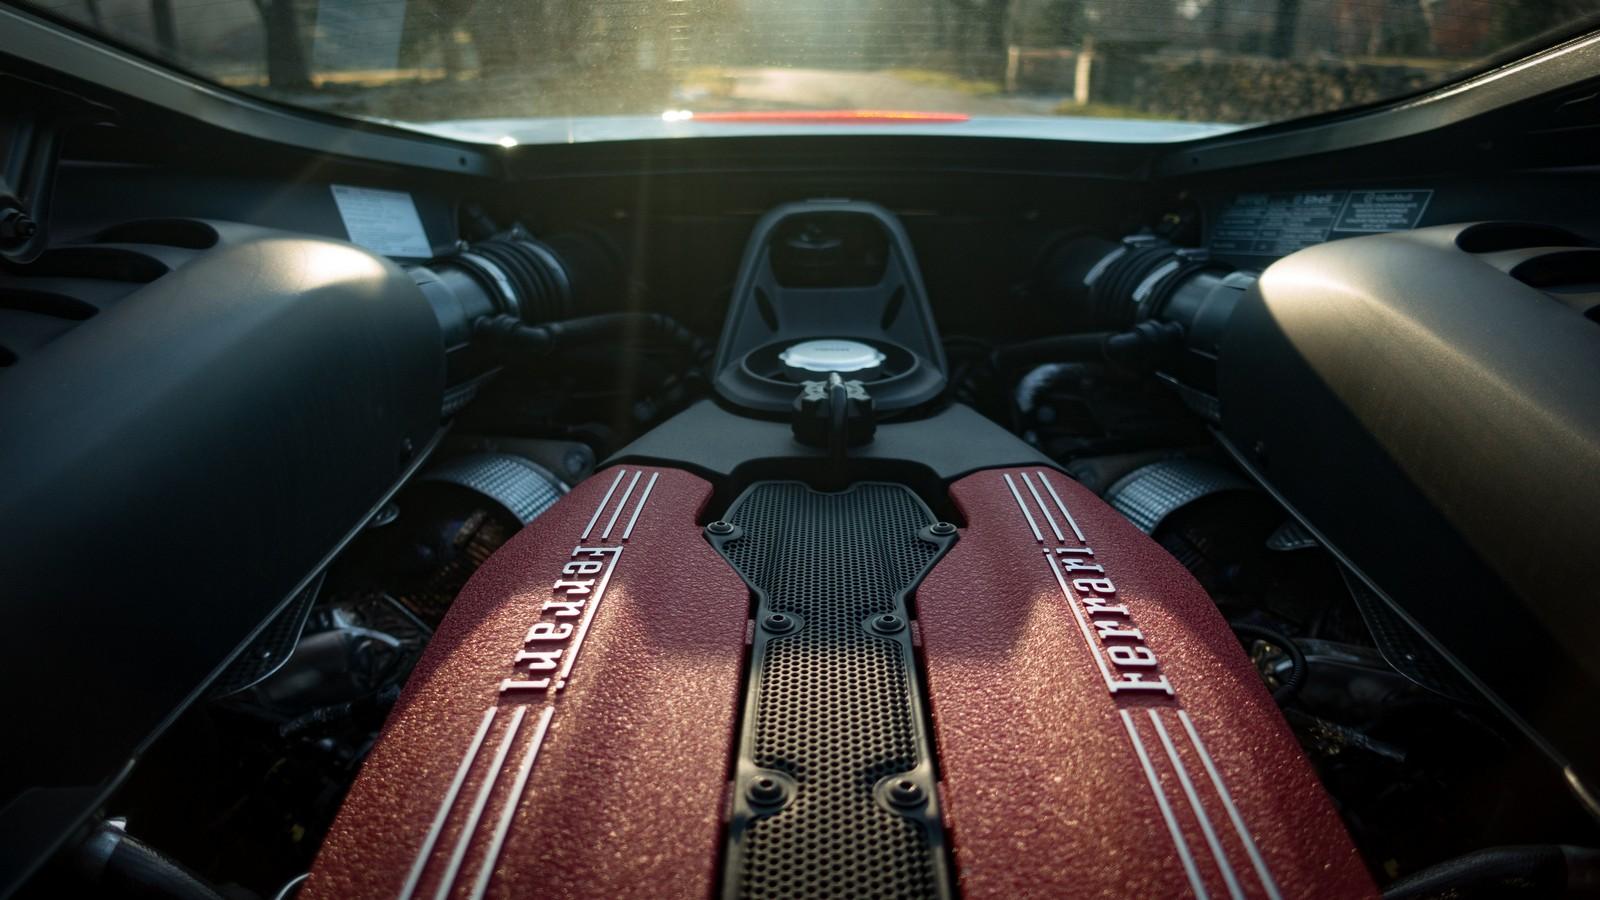 «Двигателем года» в 3-й раз подряд назван V8 от Феррари